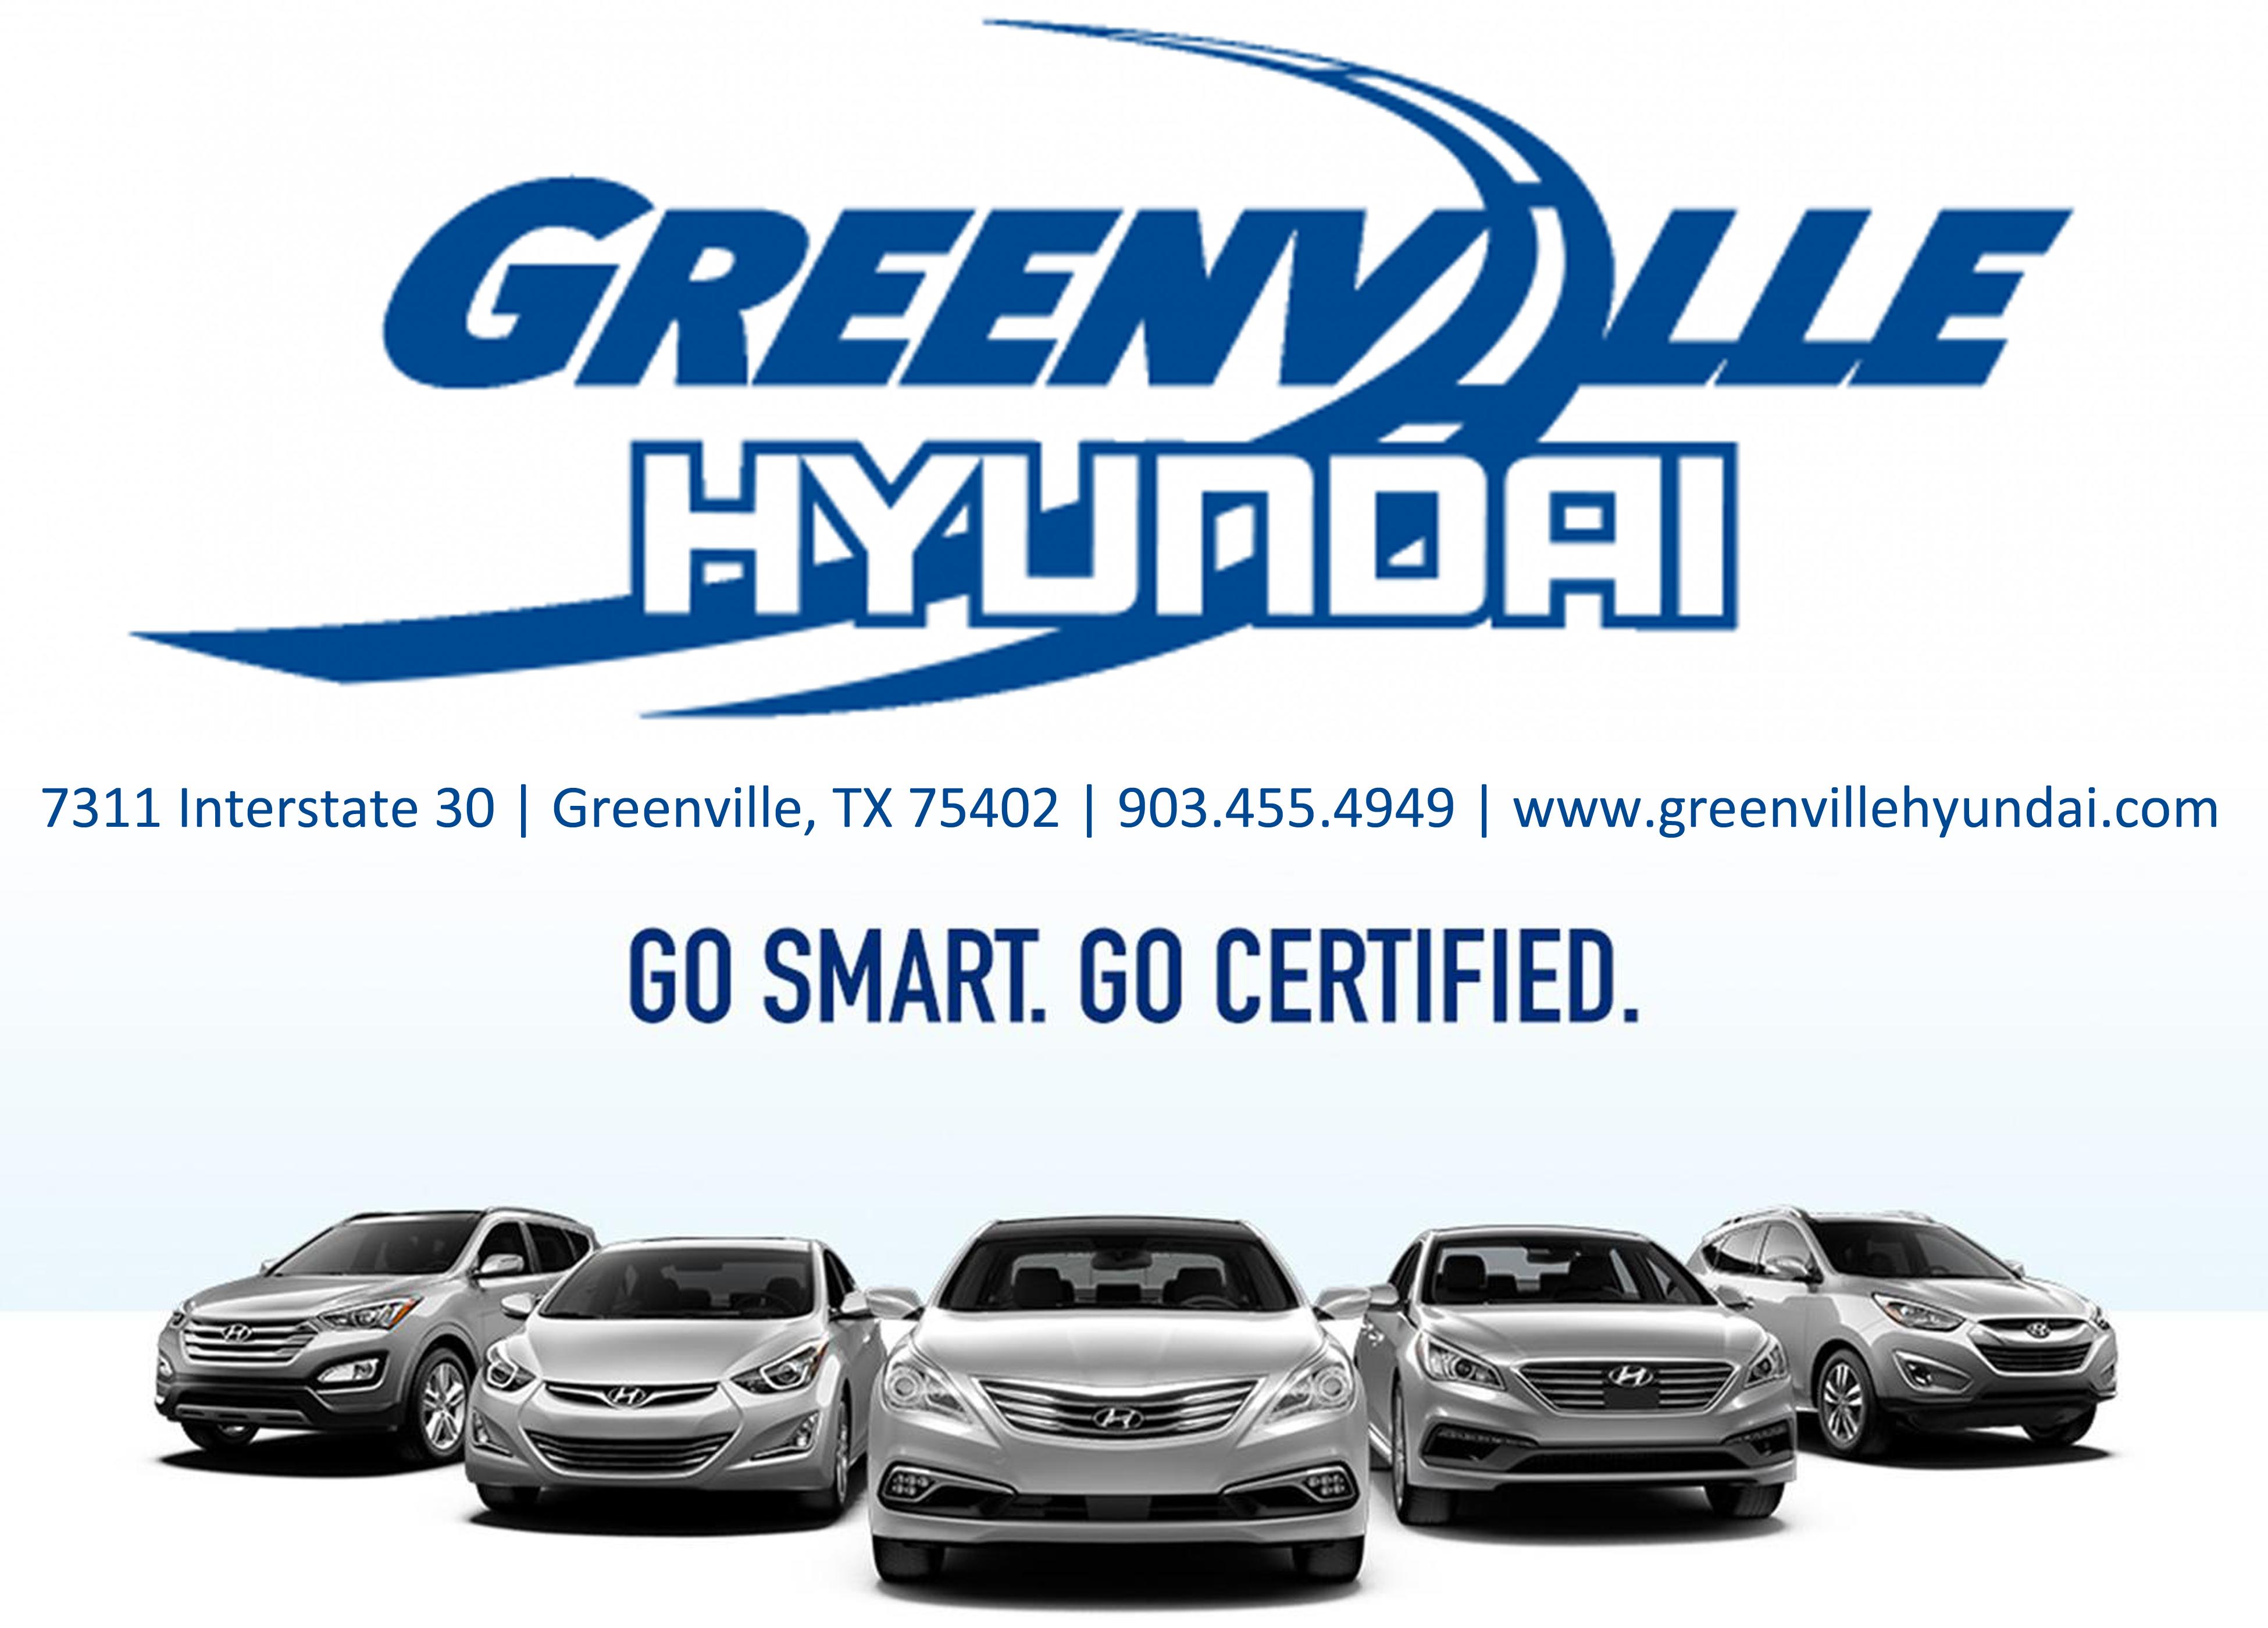 Hyundai greenville texas customer reviews testimonials for Hyundai motors customer service